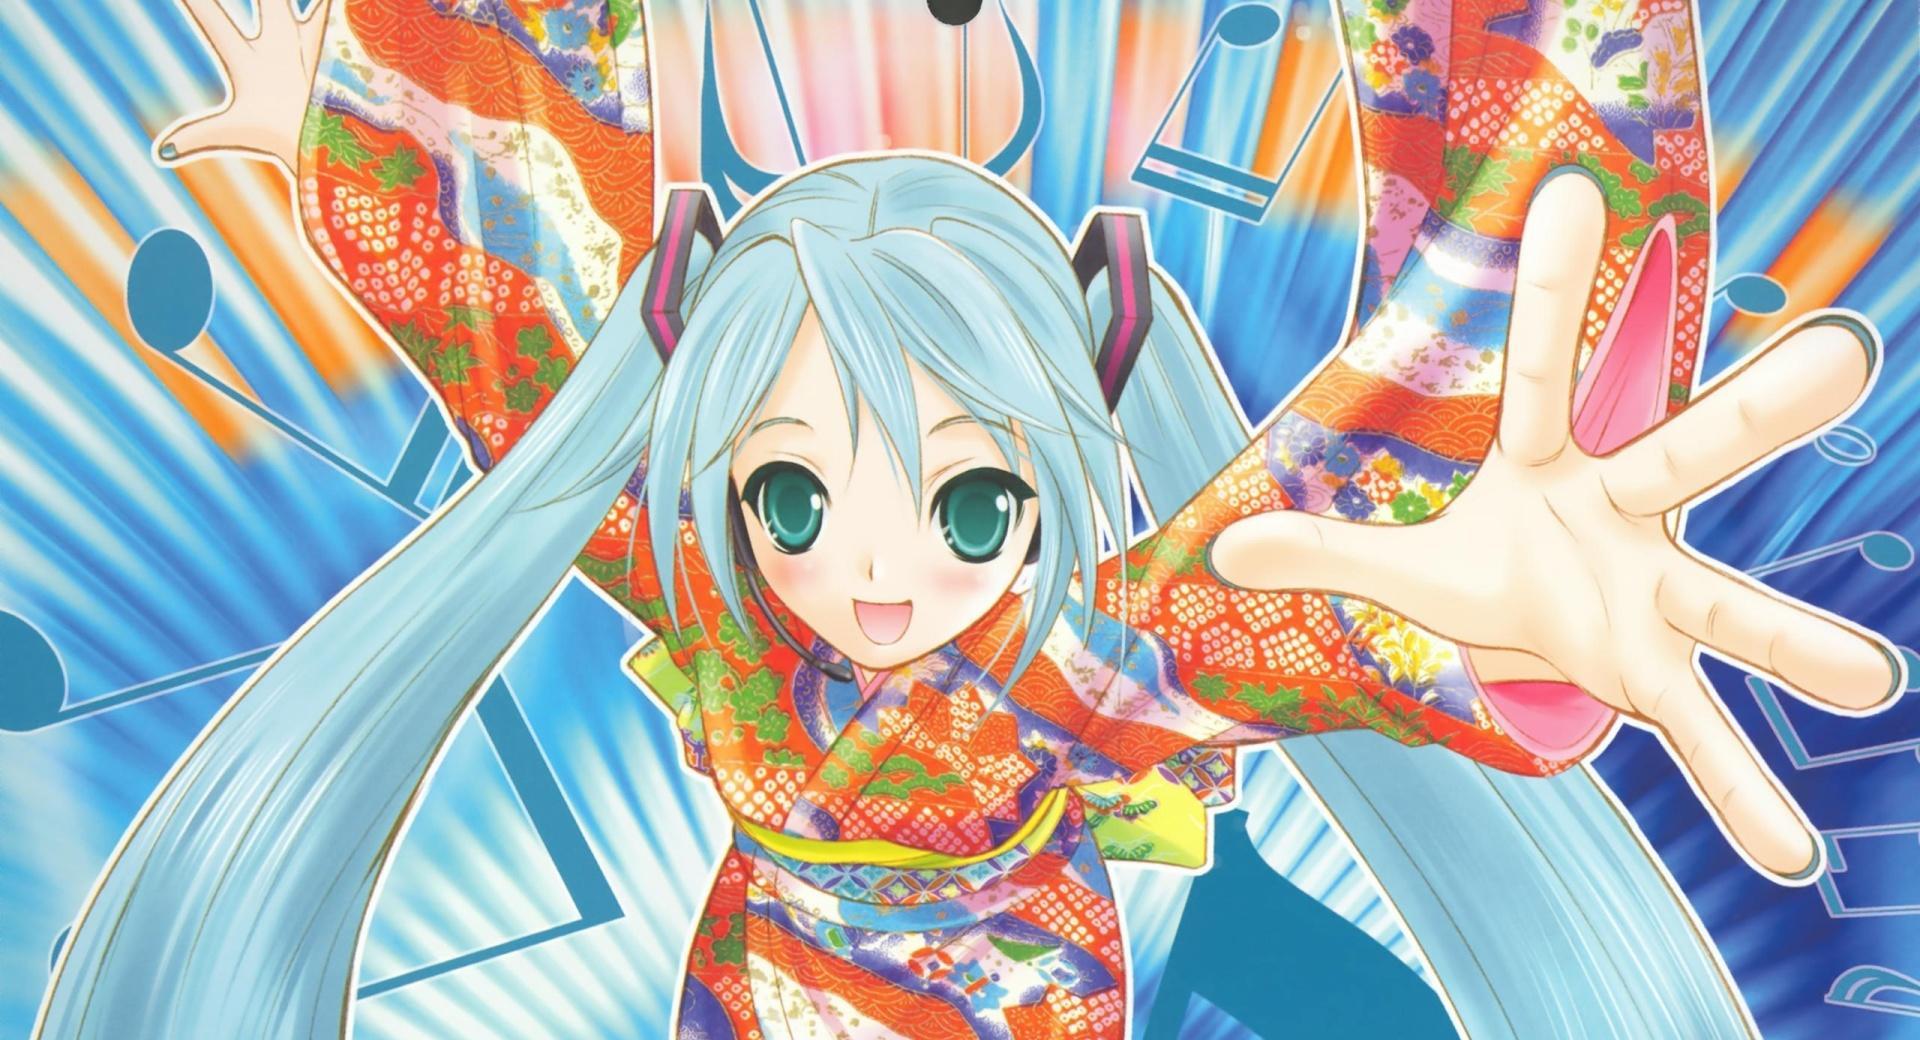 Manga Art Girl wallpapers HD quality